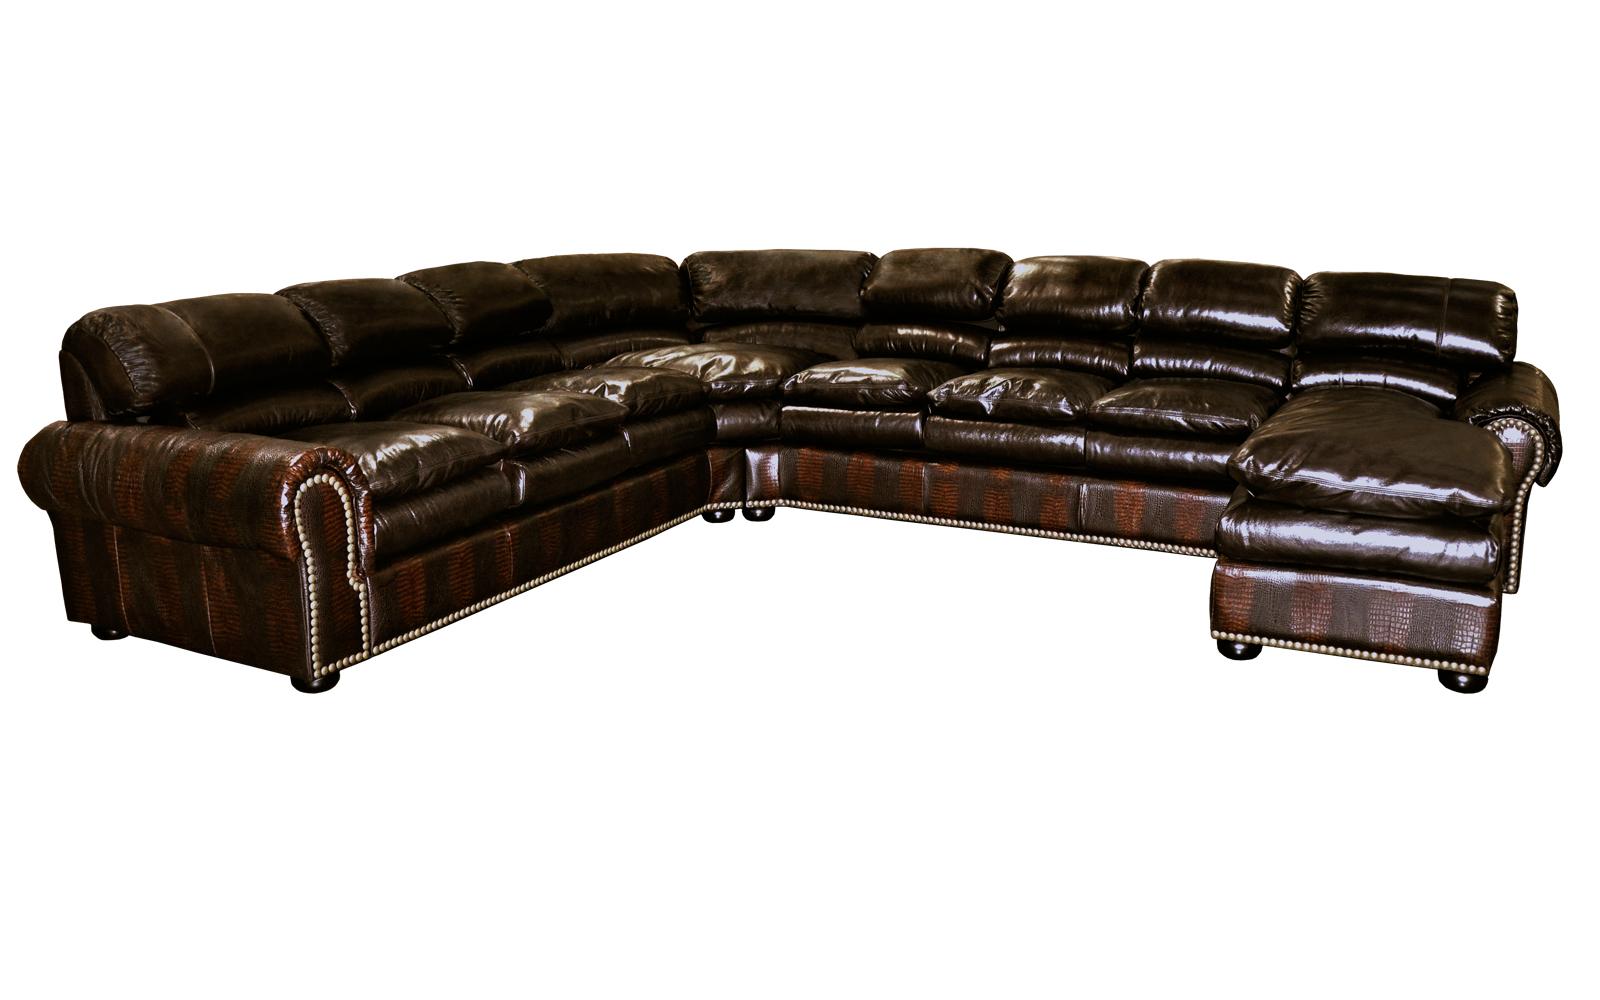 Omnia Furniture Williamsburg Leather Collection